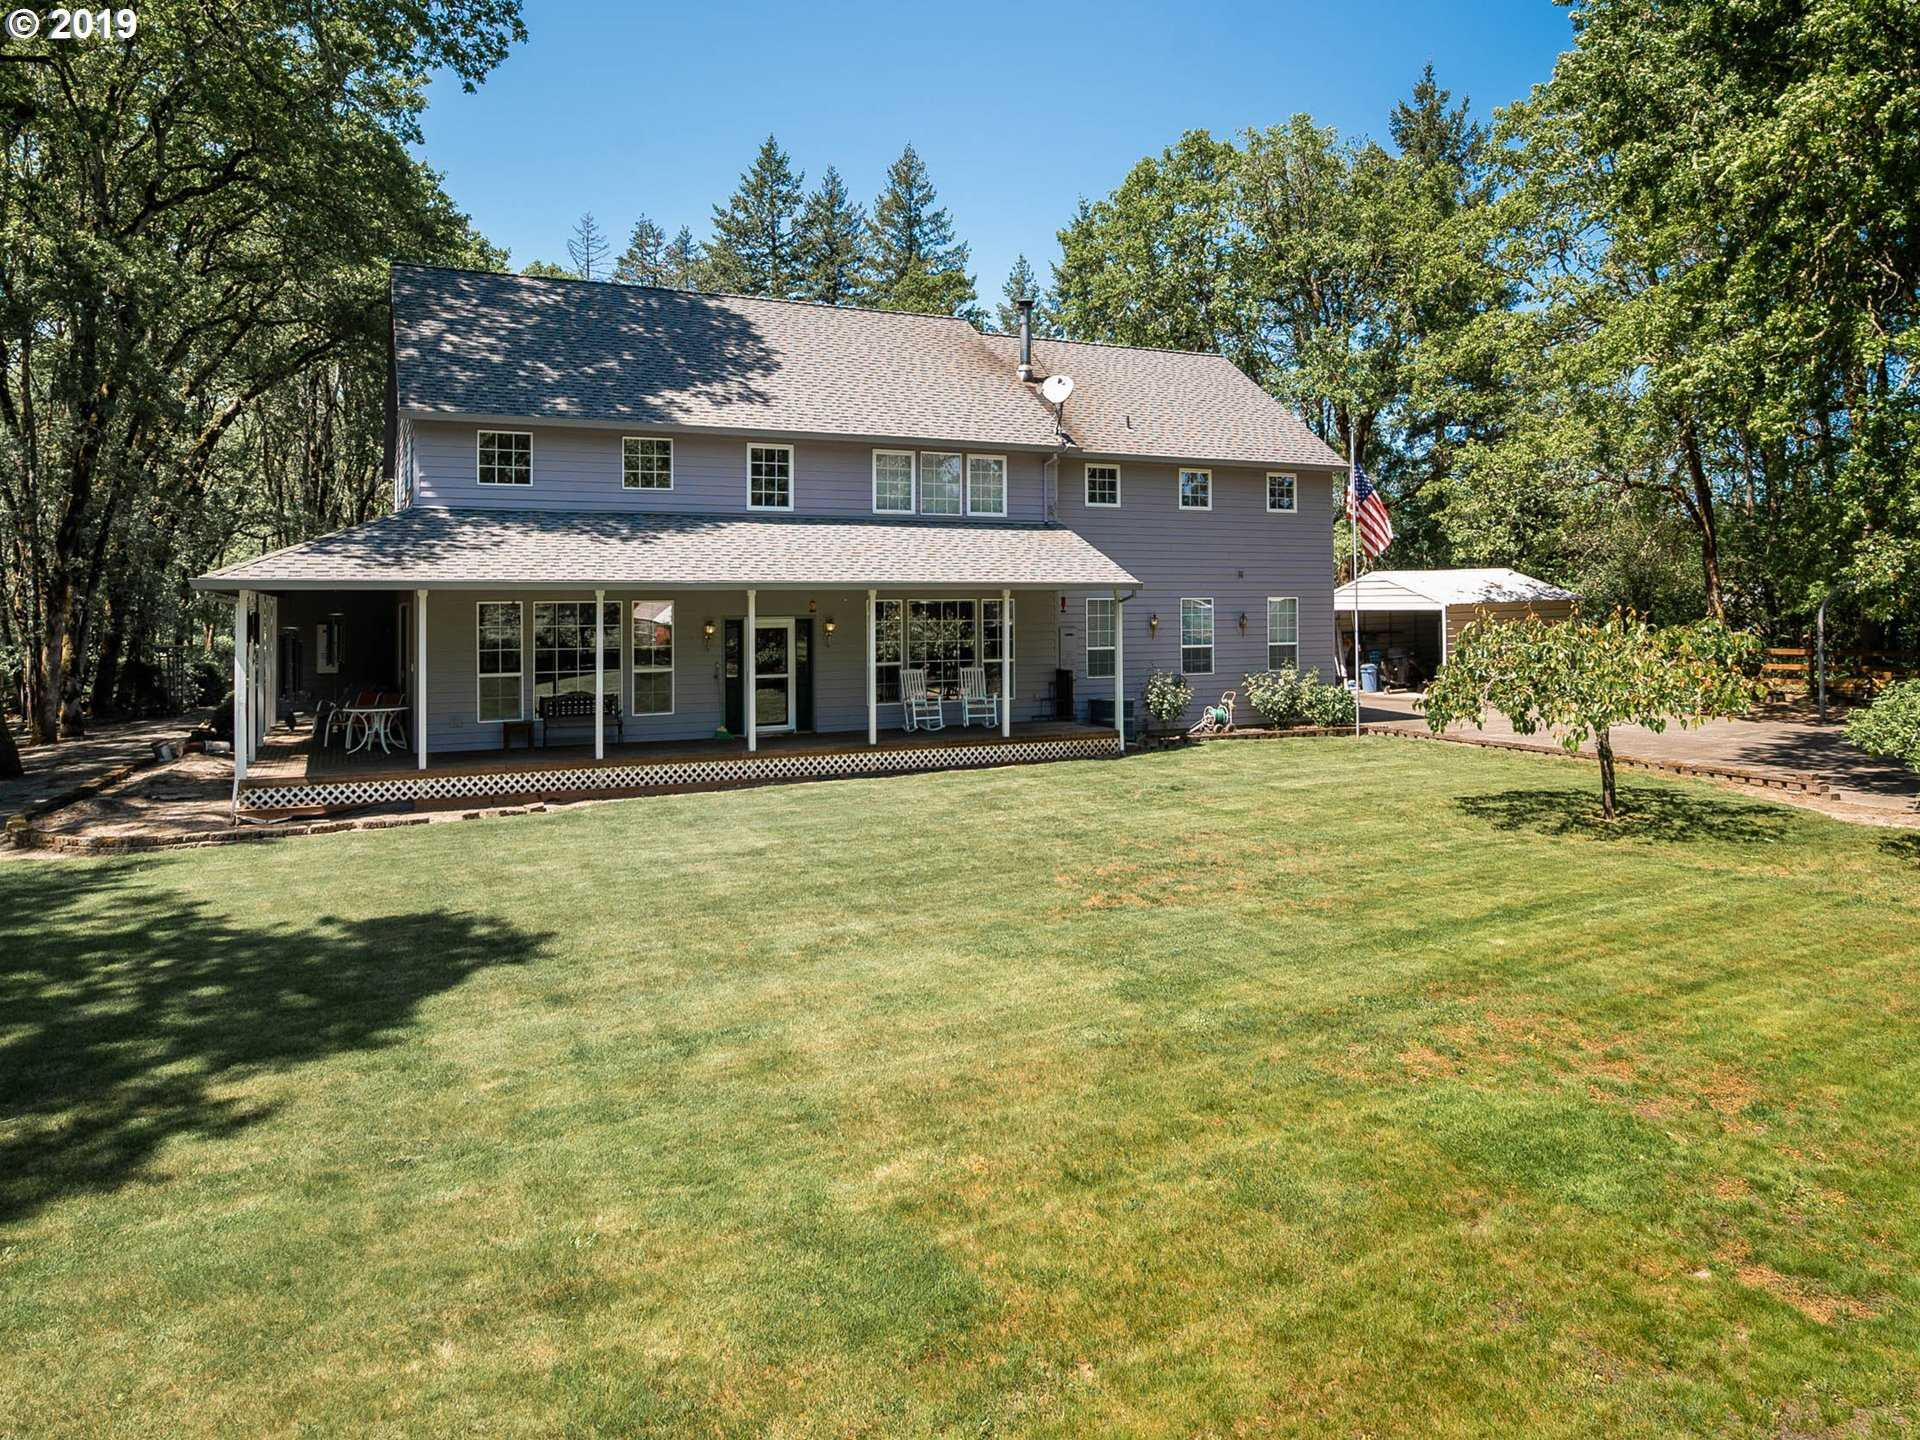 $927,700 - 3Br/3Ba -  for Sale in Helvetia, Hillsboro